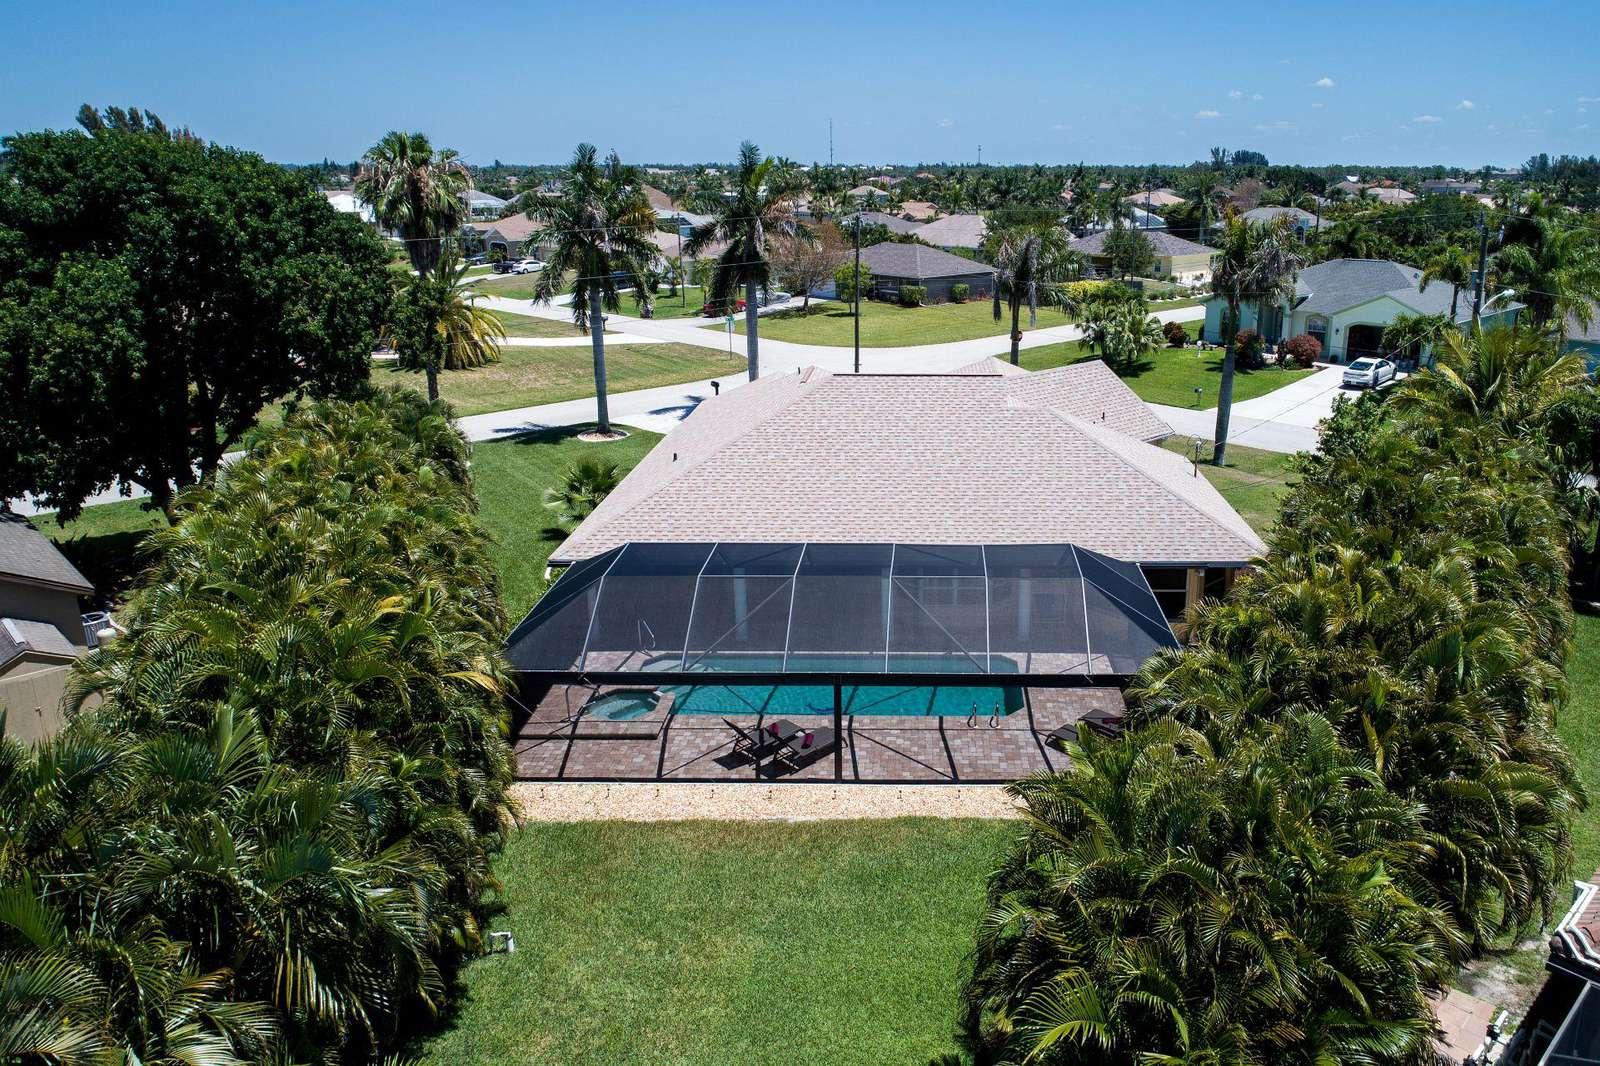 Wischis Florida Home - Ferienhaus Cape Coral - Treasure Island - Hausverwaltung - Immobilien